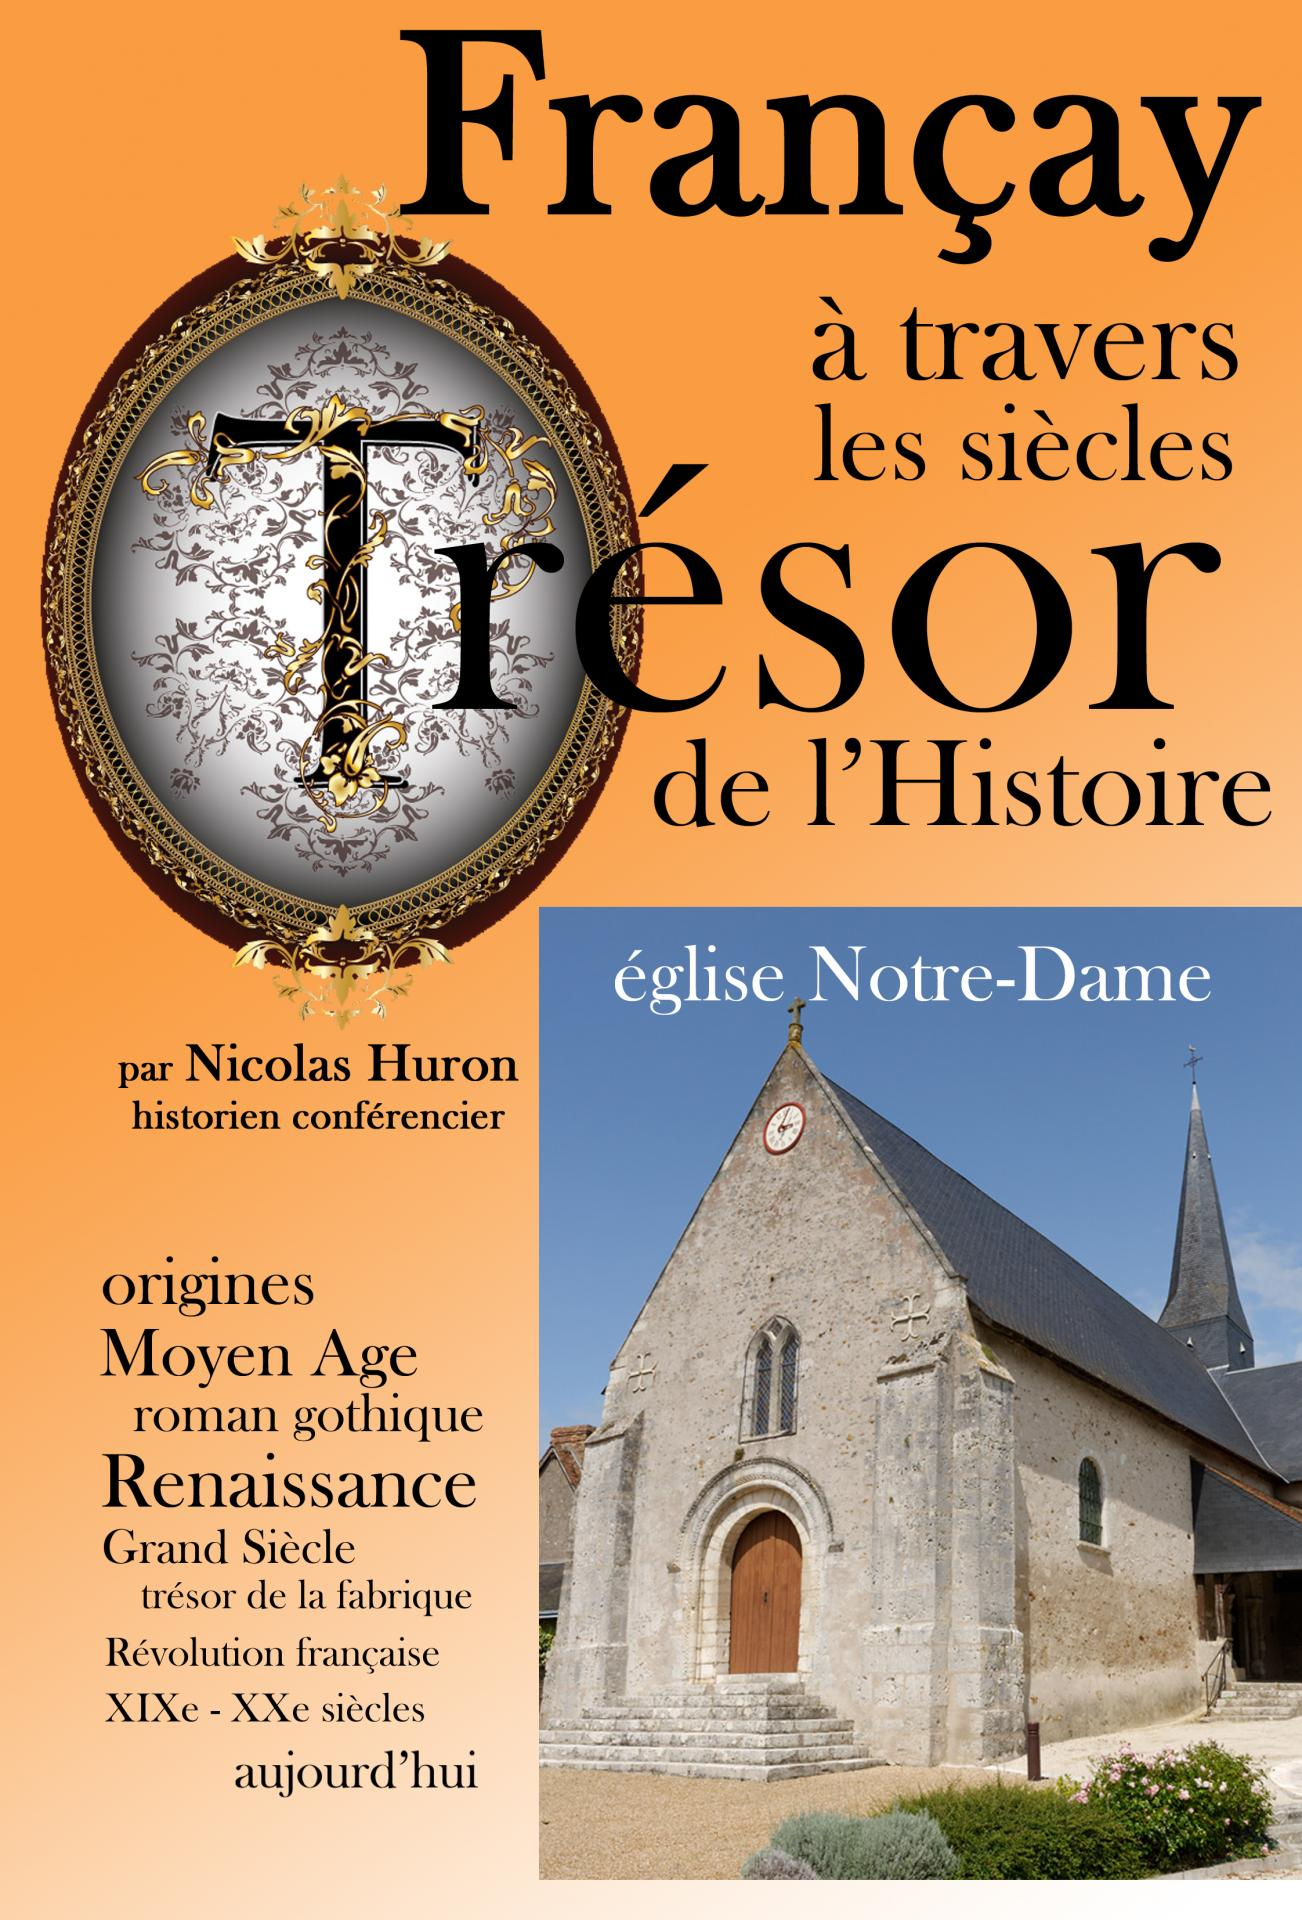 Couverture ecclesia francay 41